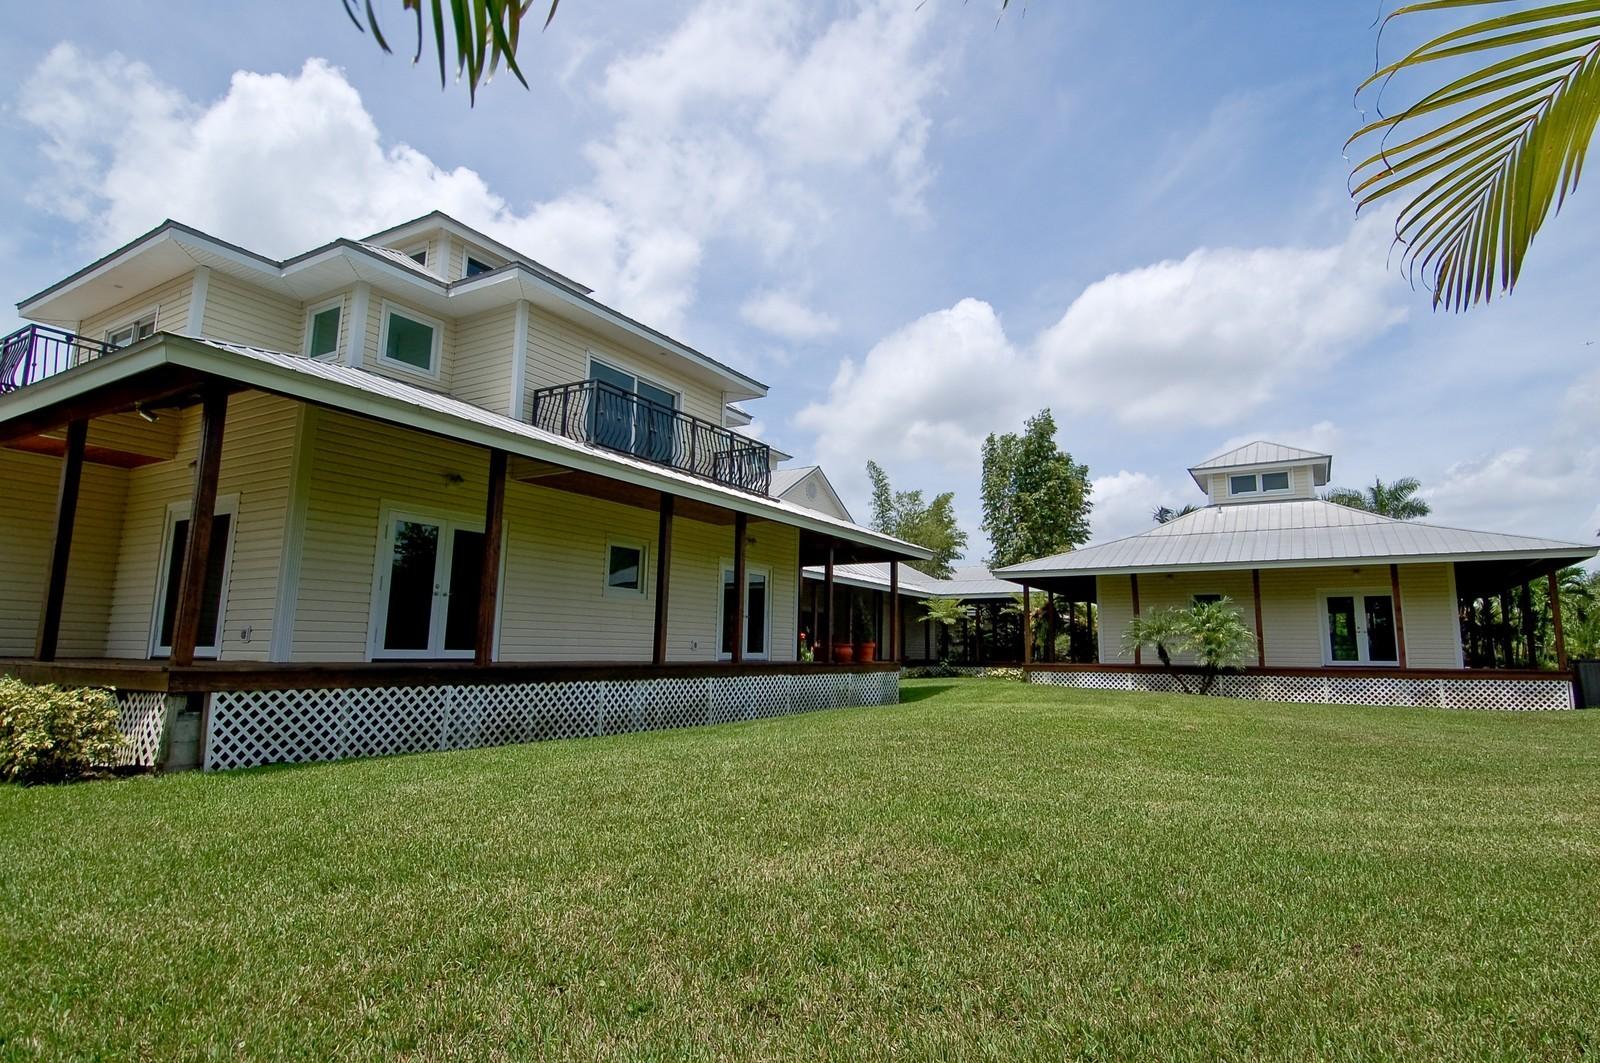 Real Estate Photography - 12800 SW 33RD DRIVE, DAVIE, FL, 33330 - Back Yard